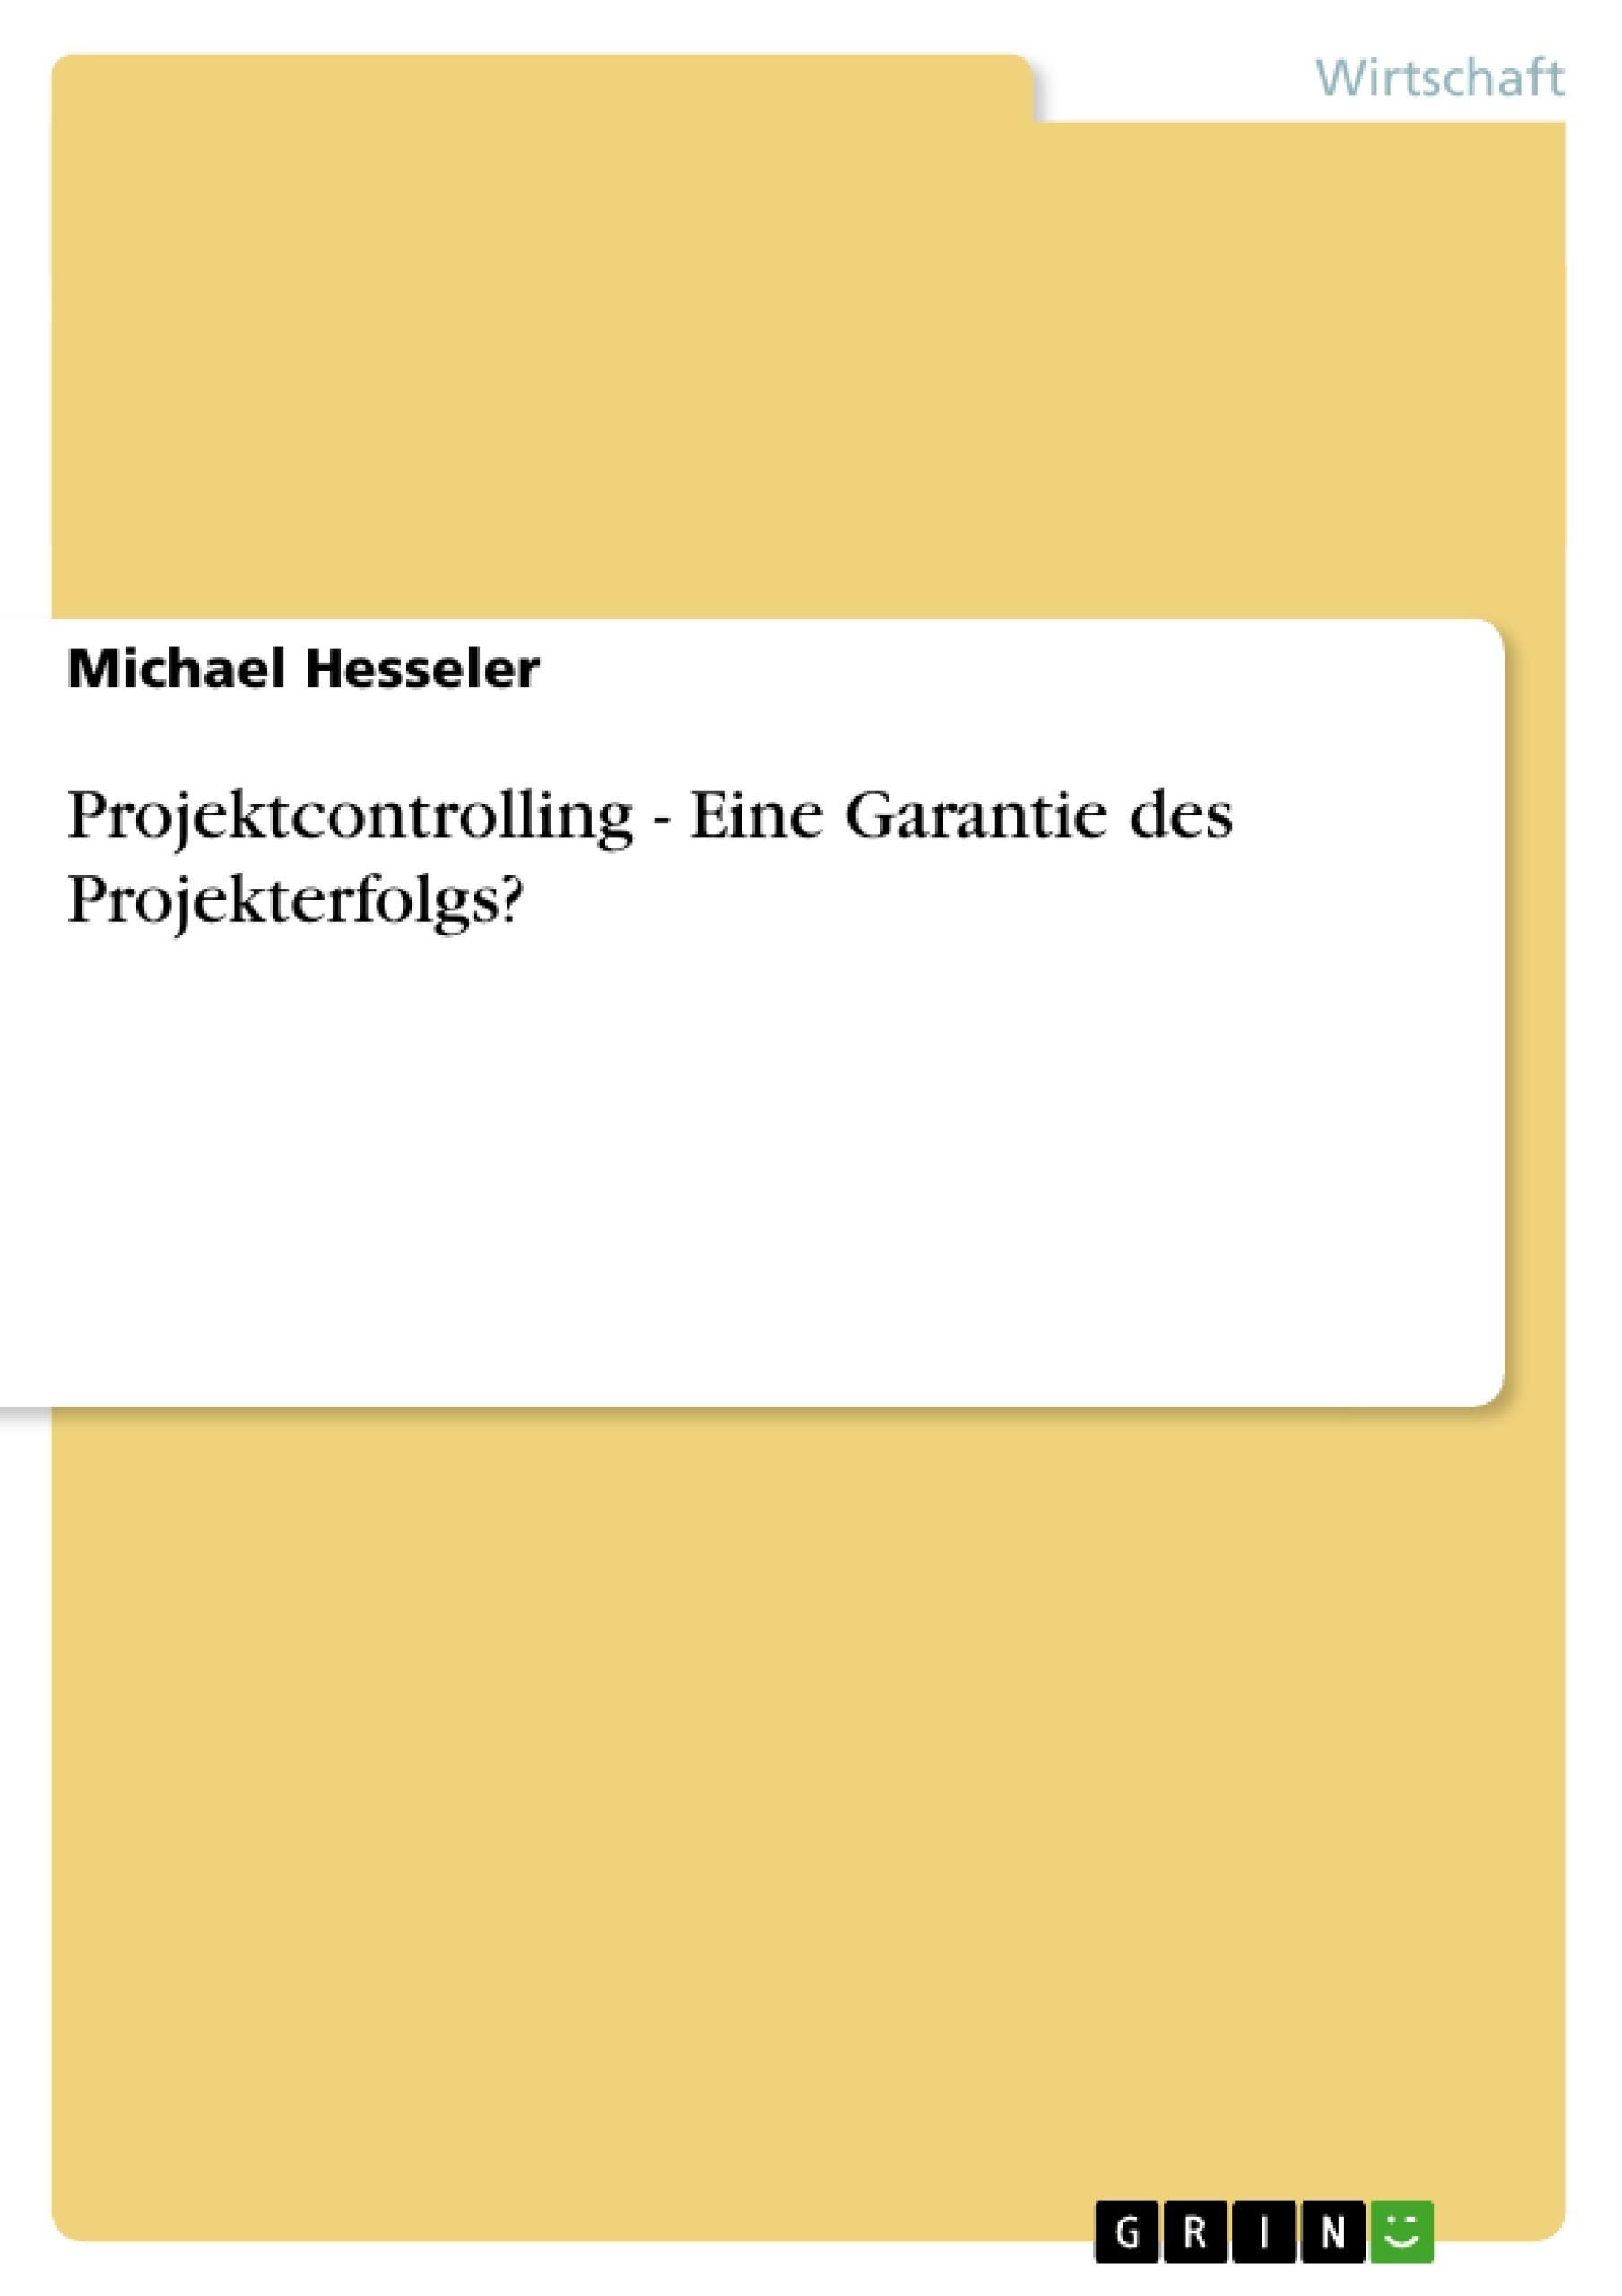 Titel: Projektcontrolling - Eine Garantie des Projekterfolgs?